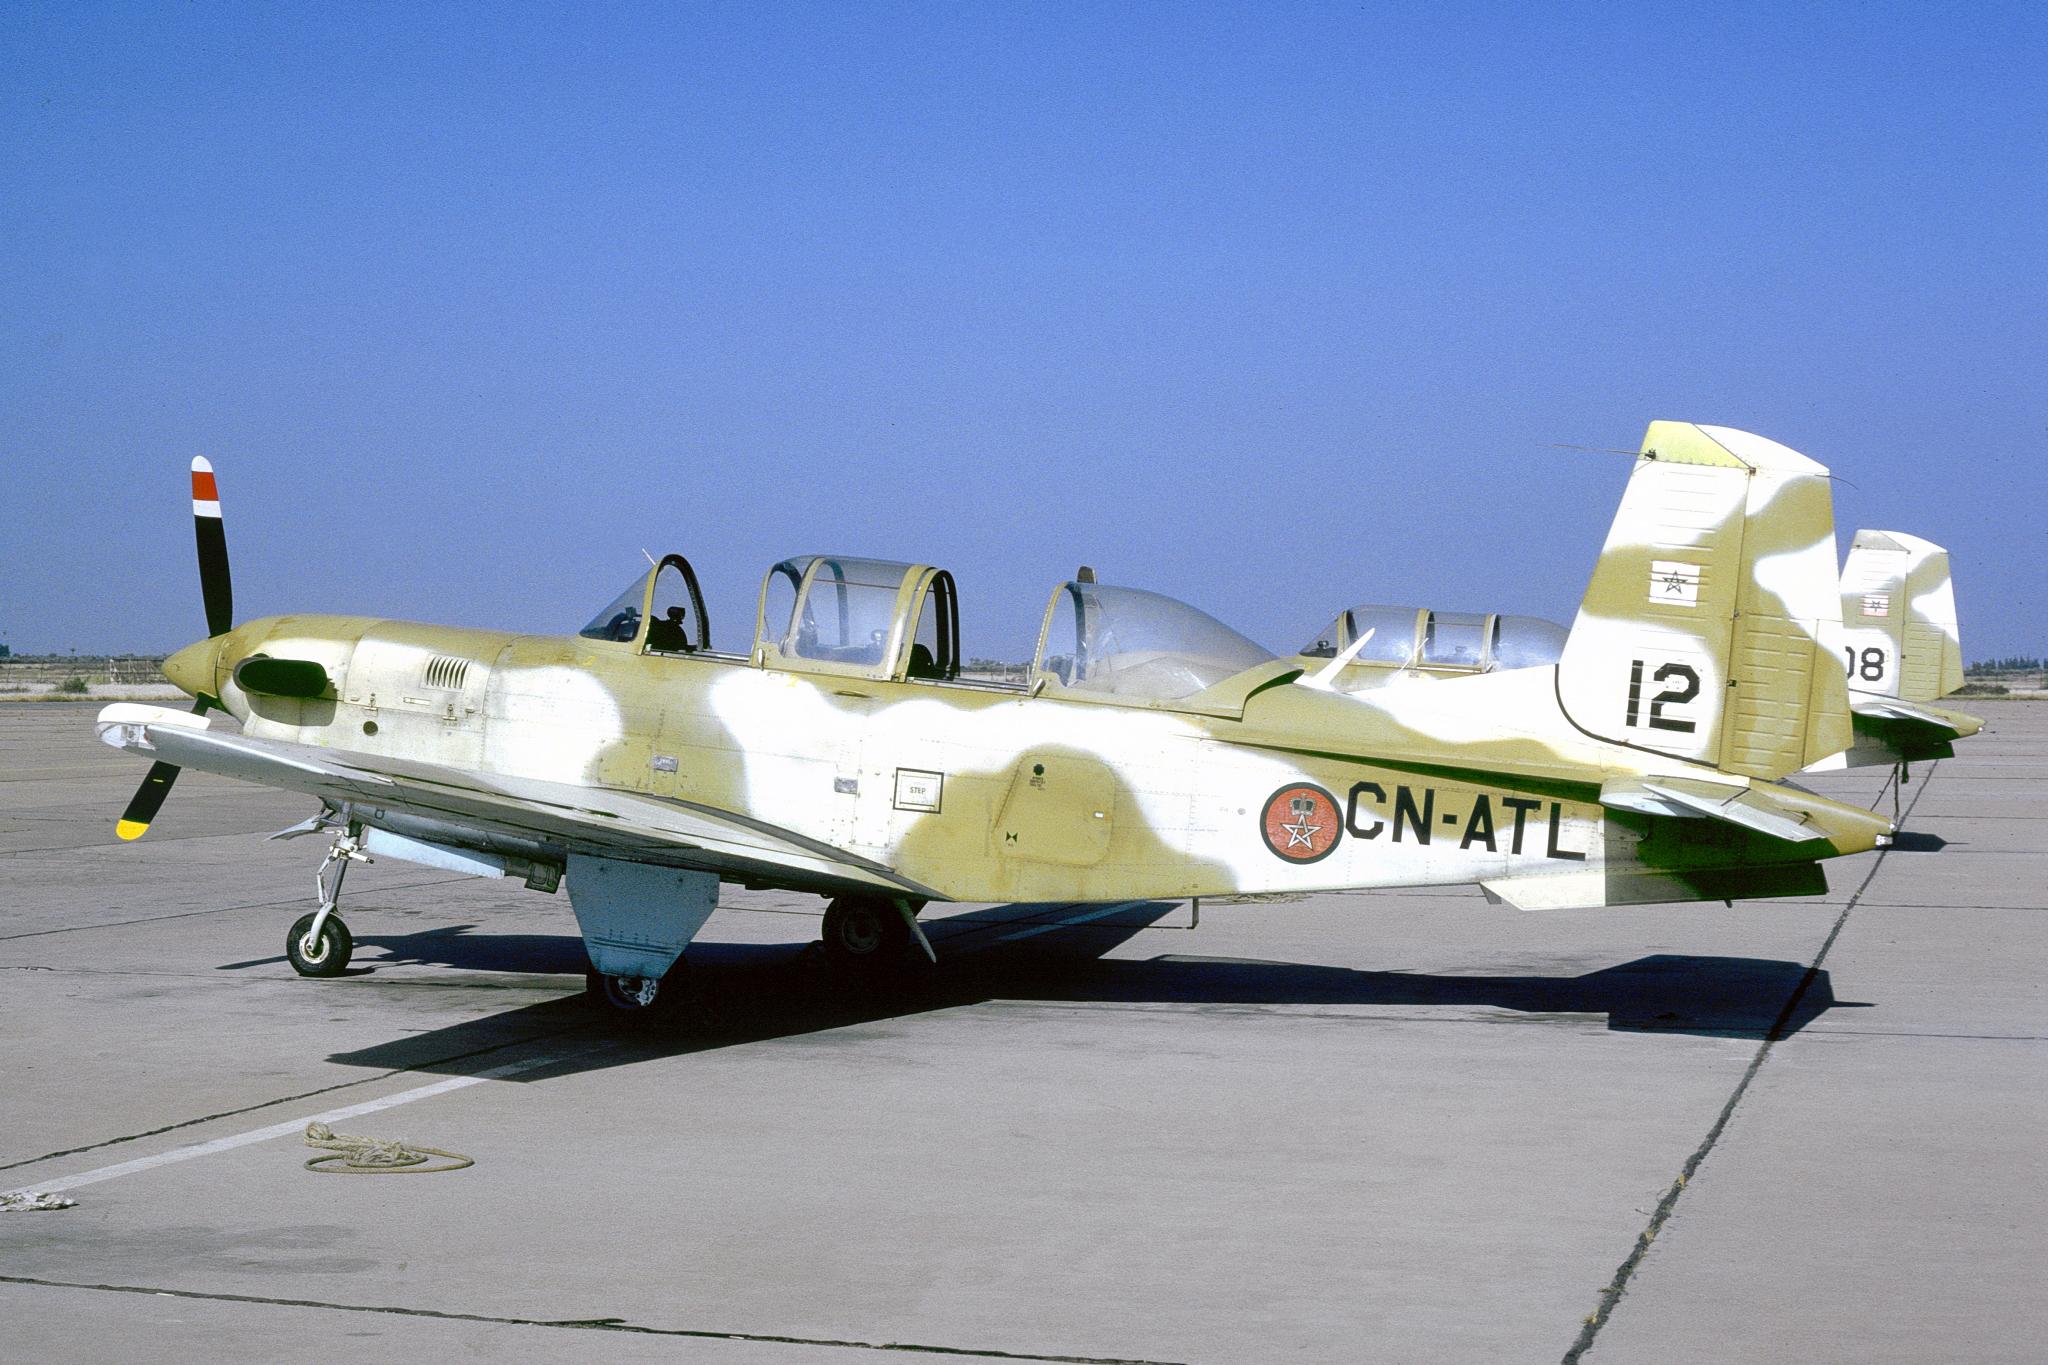 FRA: Photos anciens avions des FRA - Page 12 33178541458_7aec0dacc4_o